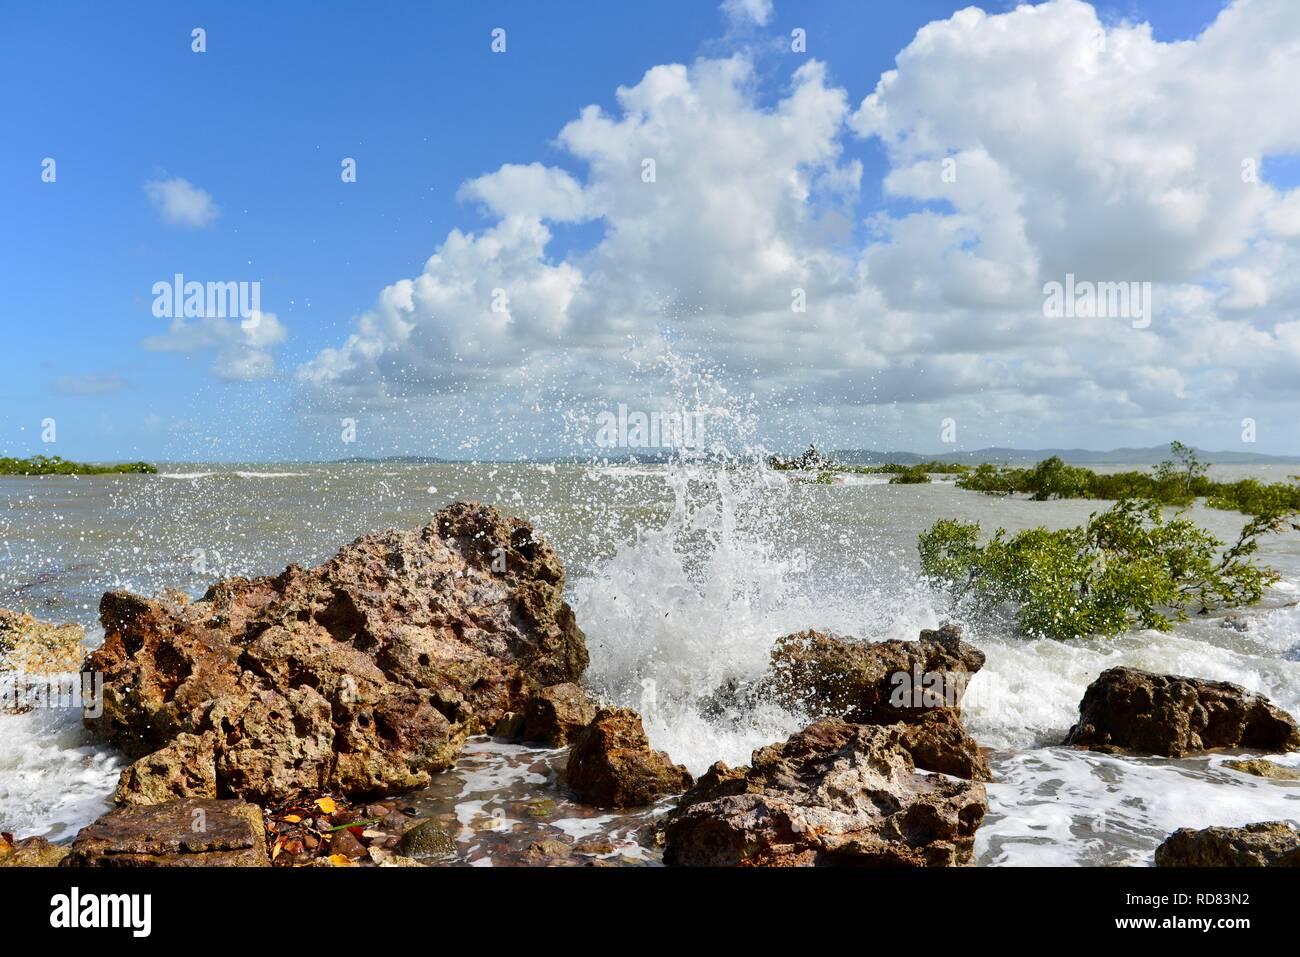 Waves crashing against rugged rocks near mangroves, Yuibera trail at Cape Hillsborough National Park, Queensland, Australia Stock Photo